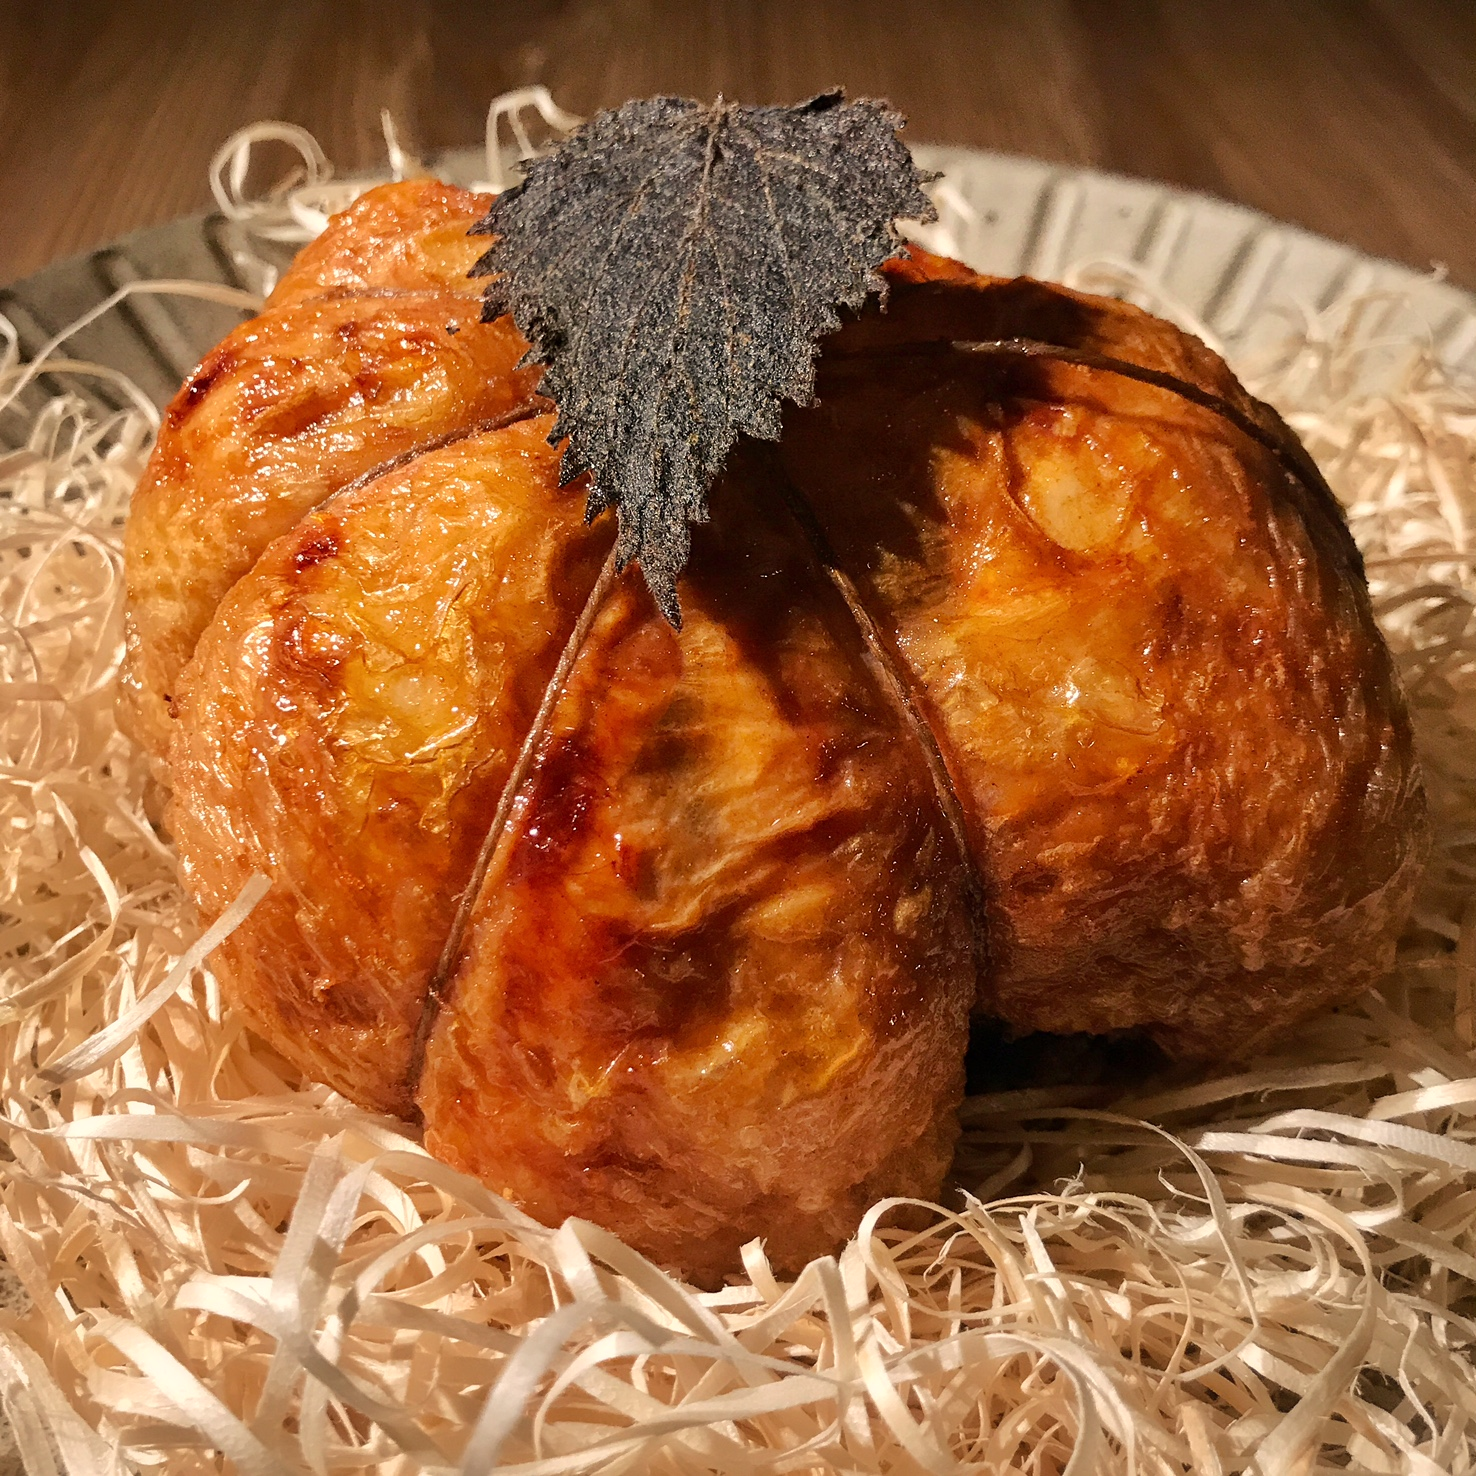 Boneless chicken with teriyaki glaze